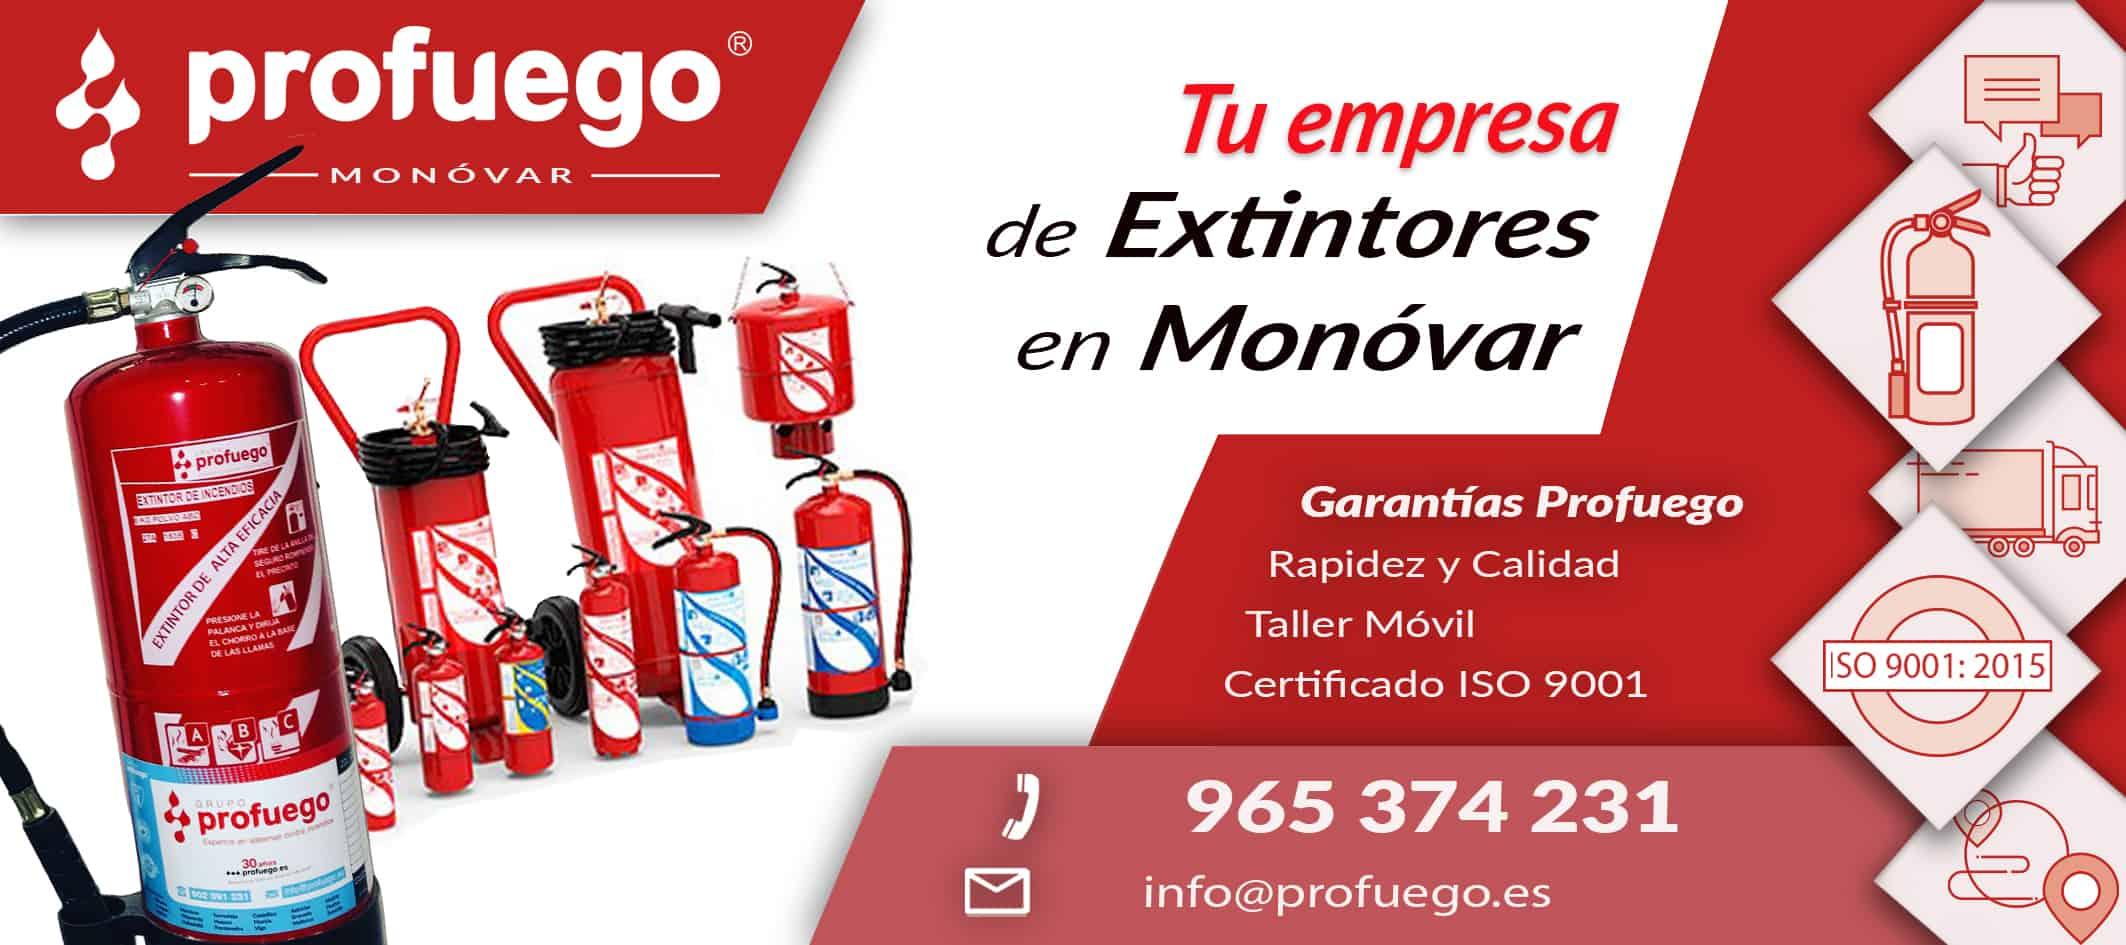 extintores monovar